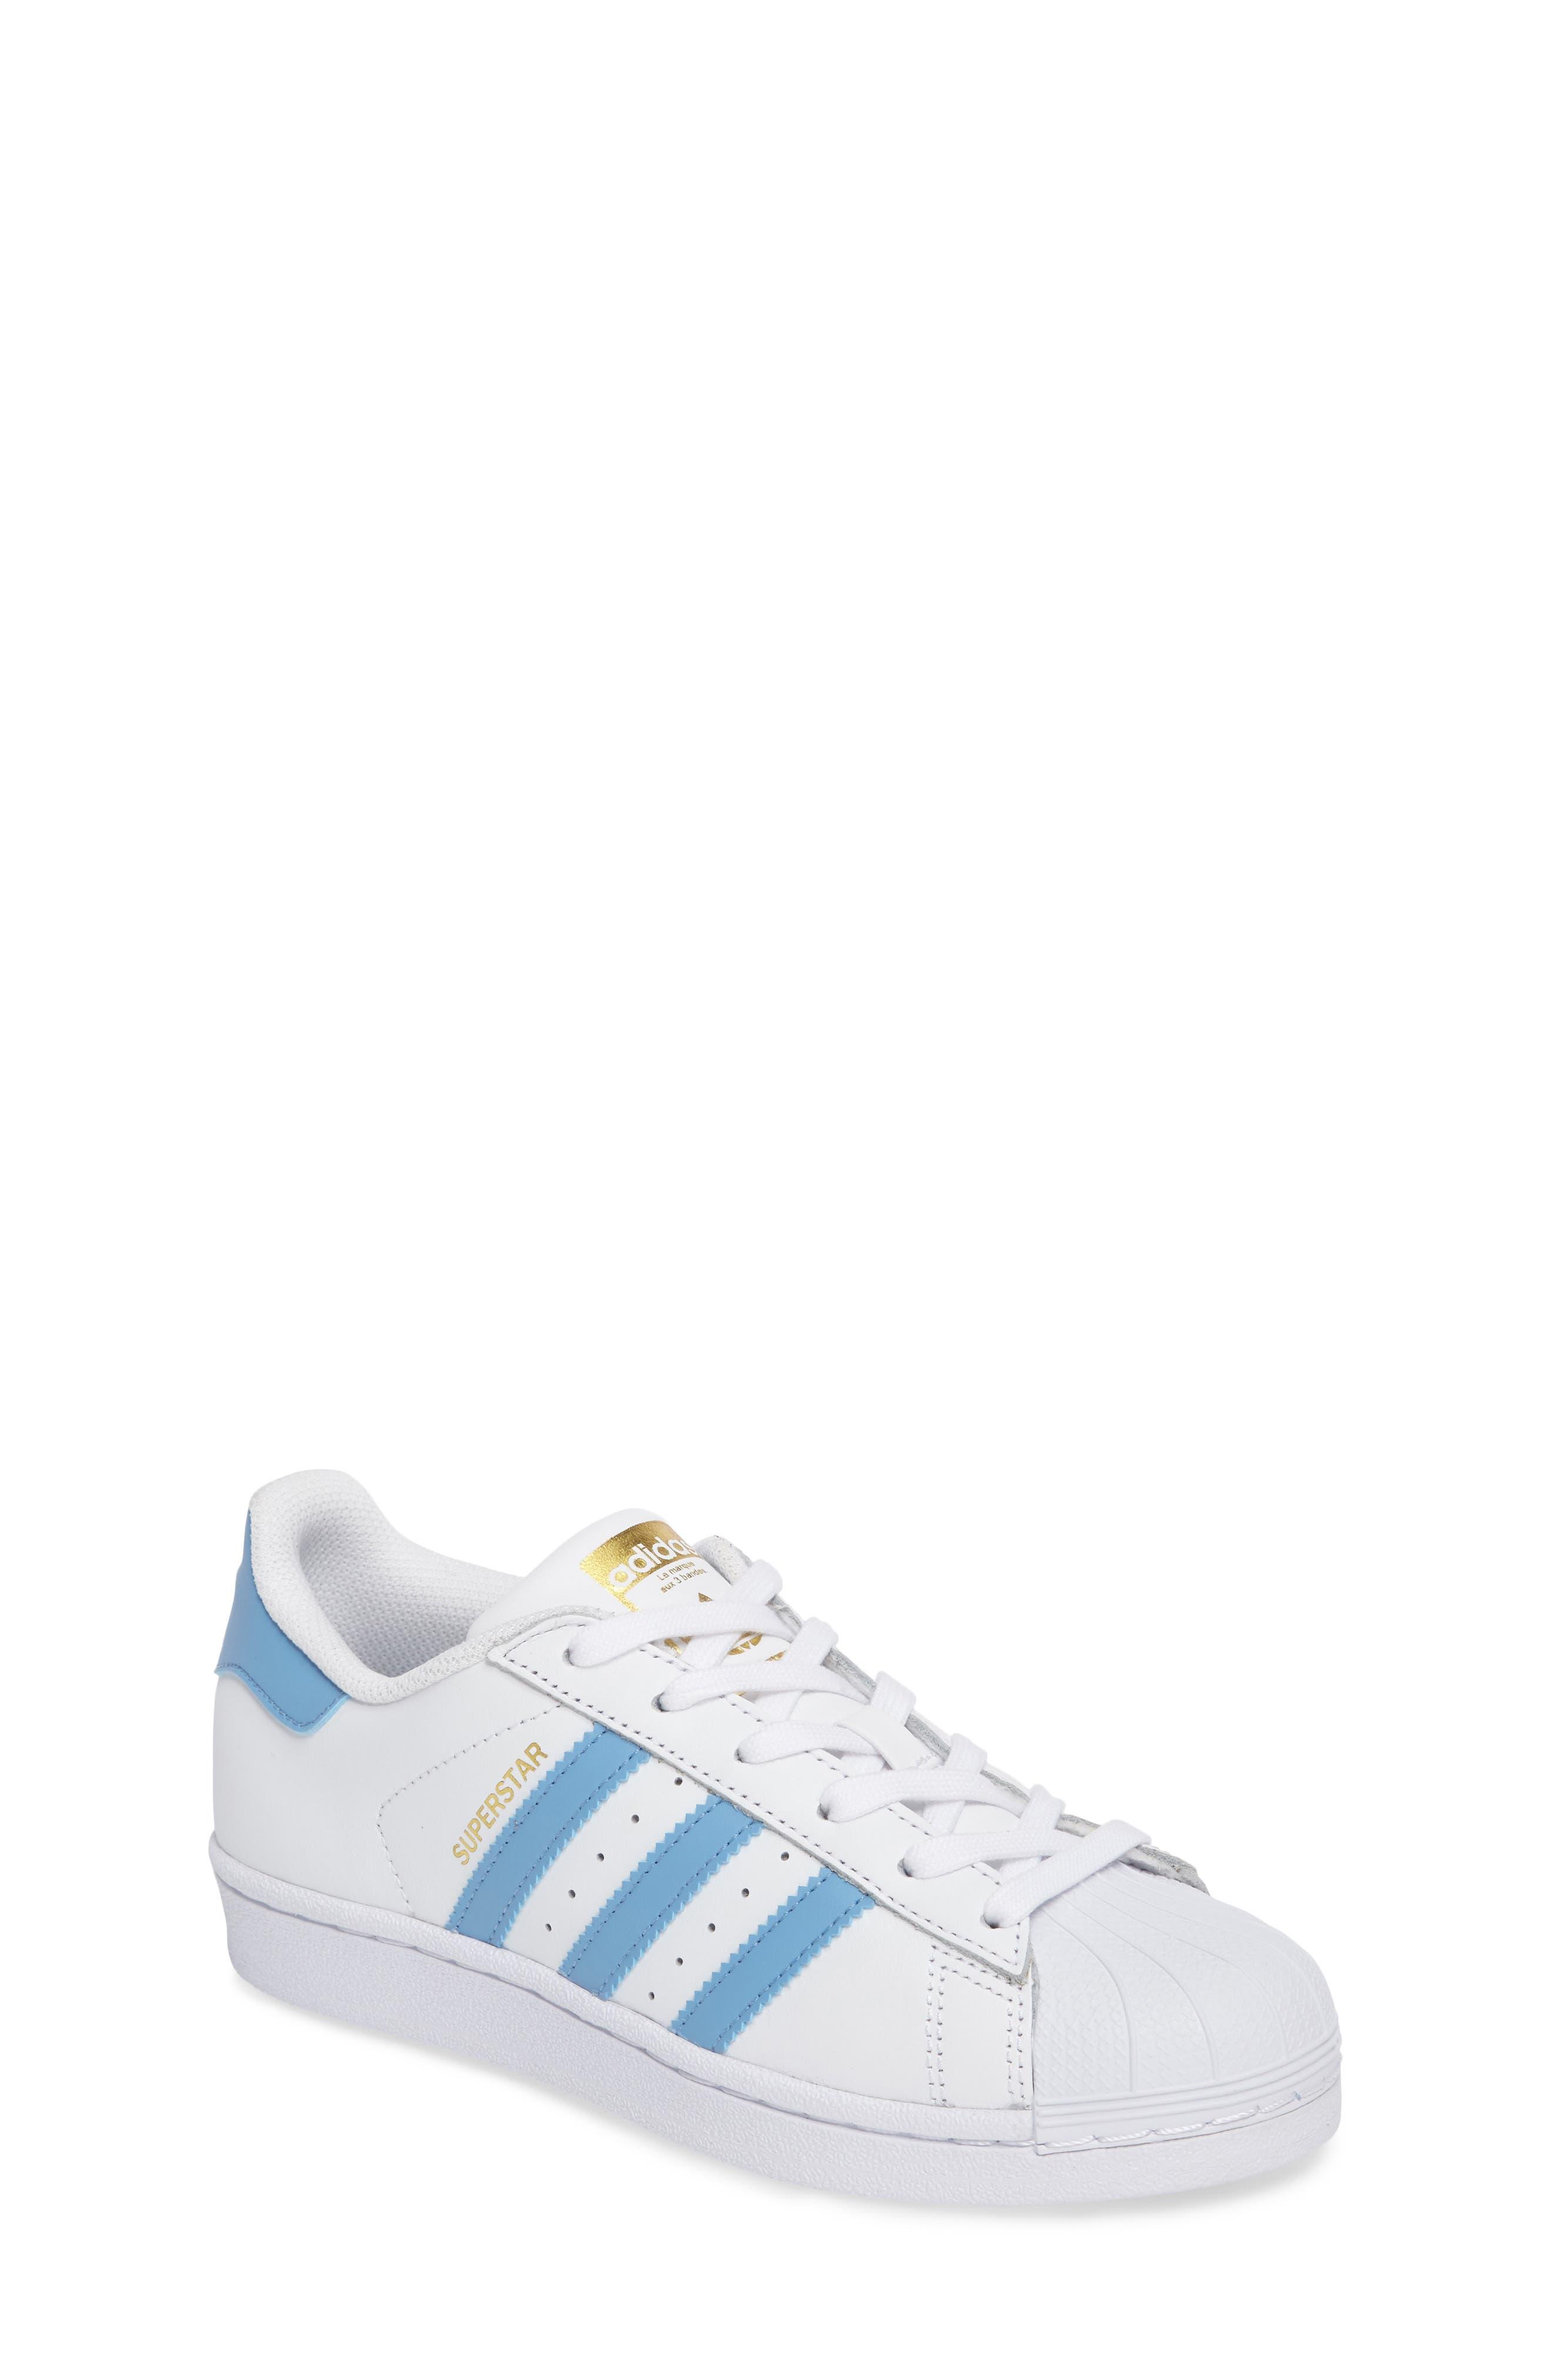 Superstar Foundation Sneaker,                             Main thumbnail 1, color,                             White/ Light Blue/ Gold